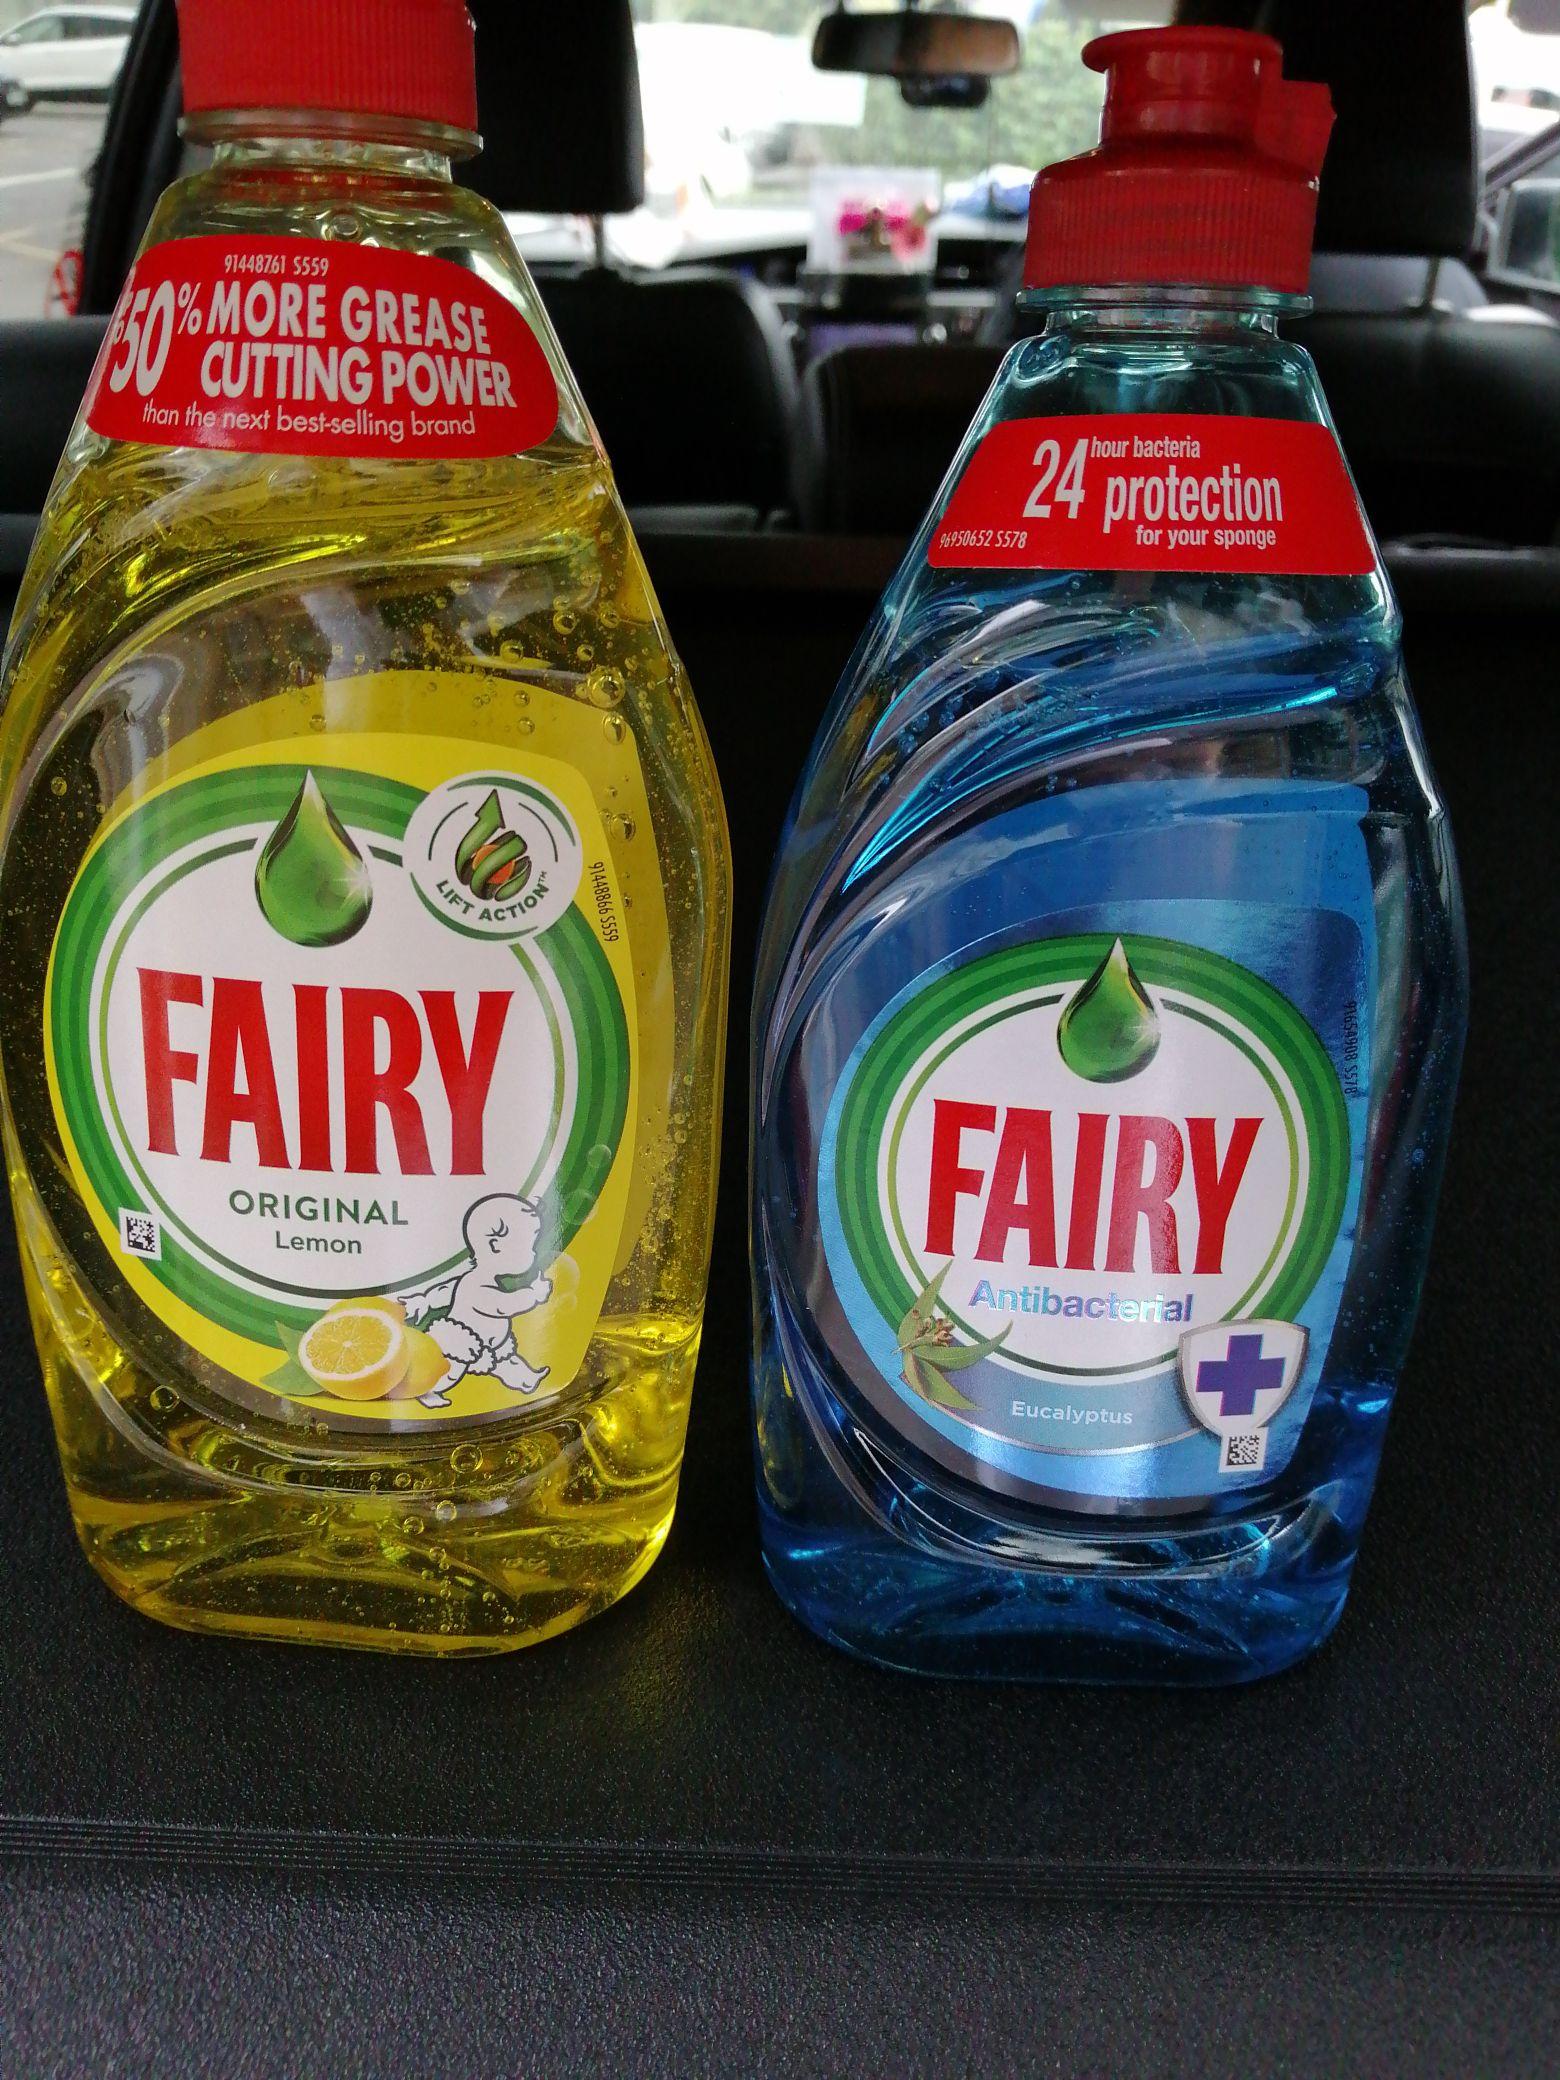 Fairy washing up liquid 383ml 65p @ Marks & Spencer (Shoreham)